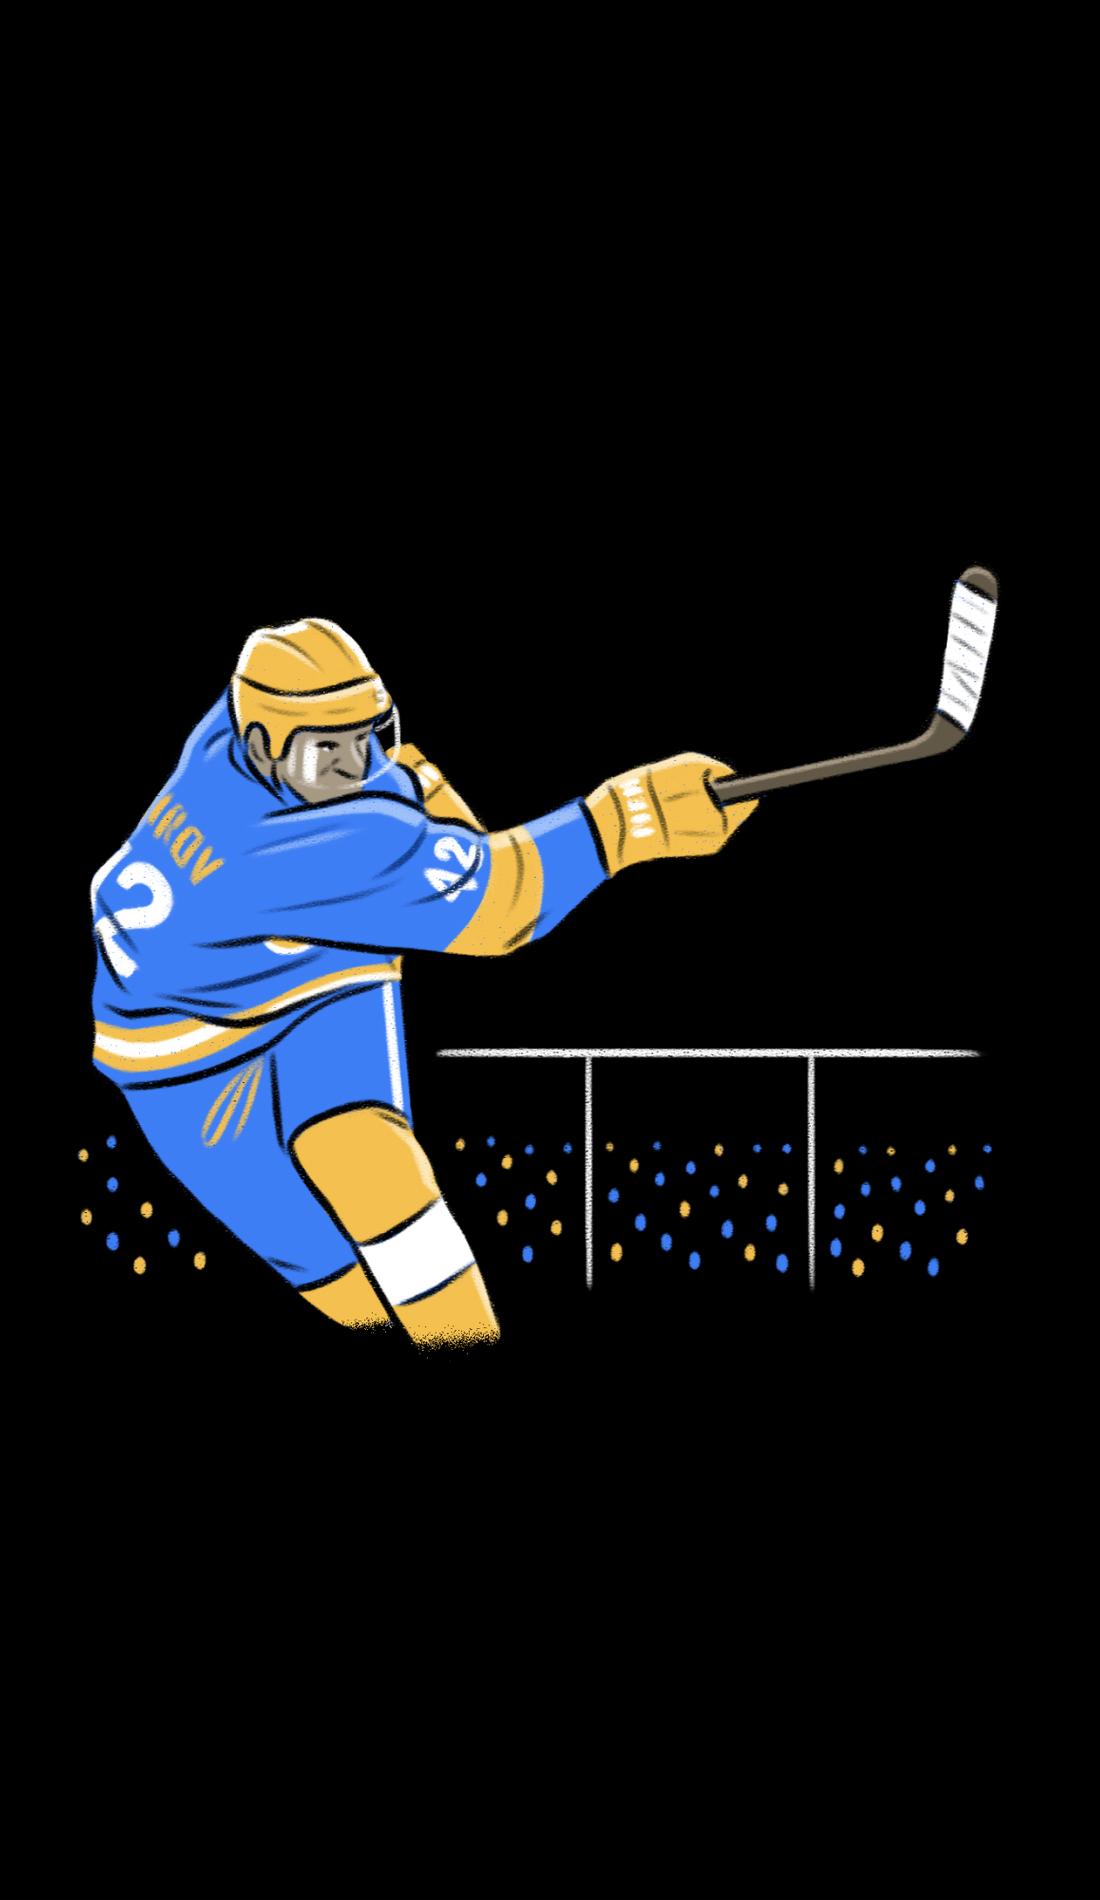 A Providence Friars Hockey live event